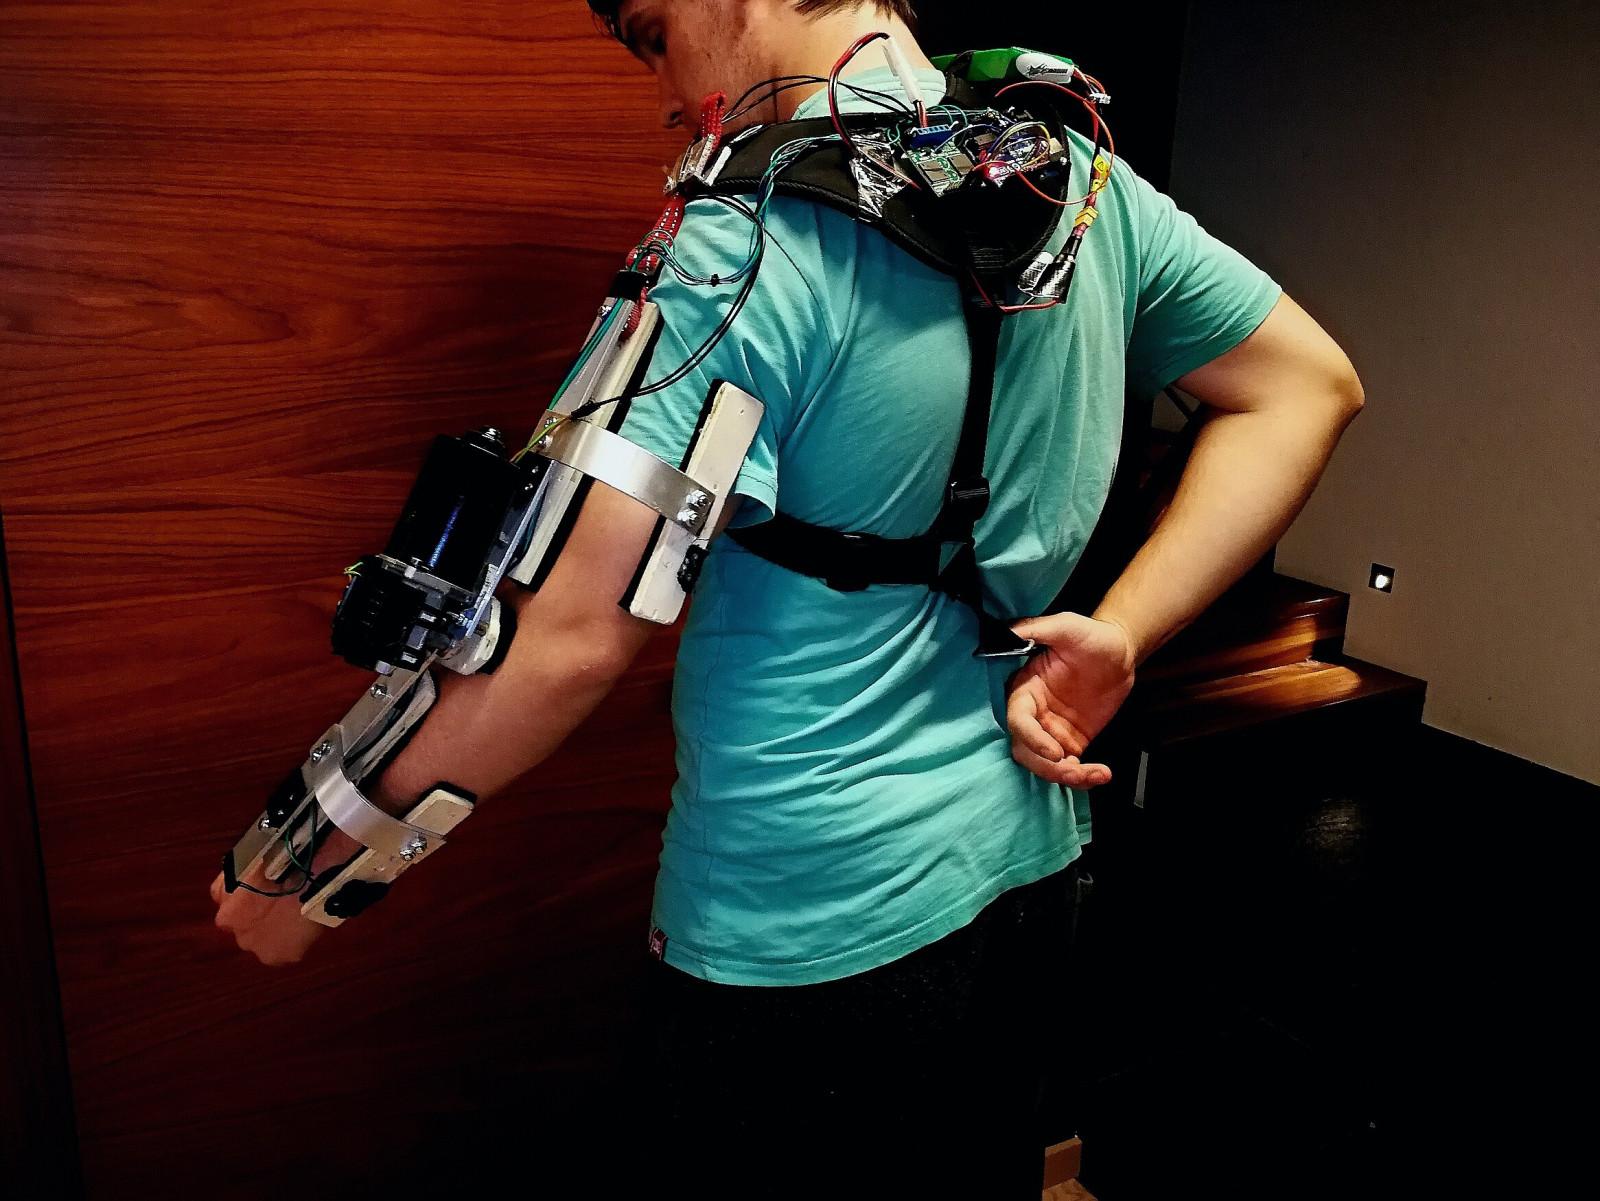 Arduino exoarm an powered assistive